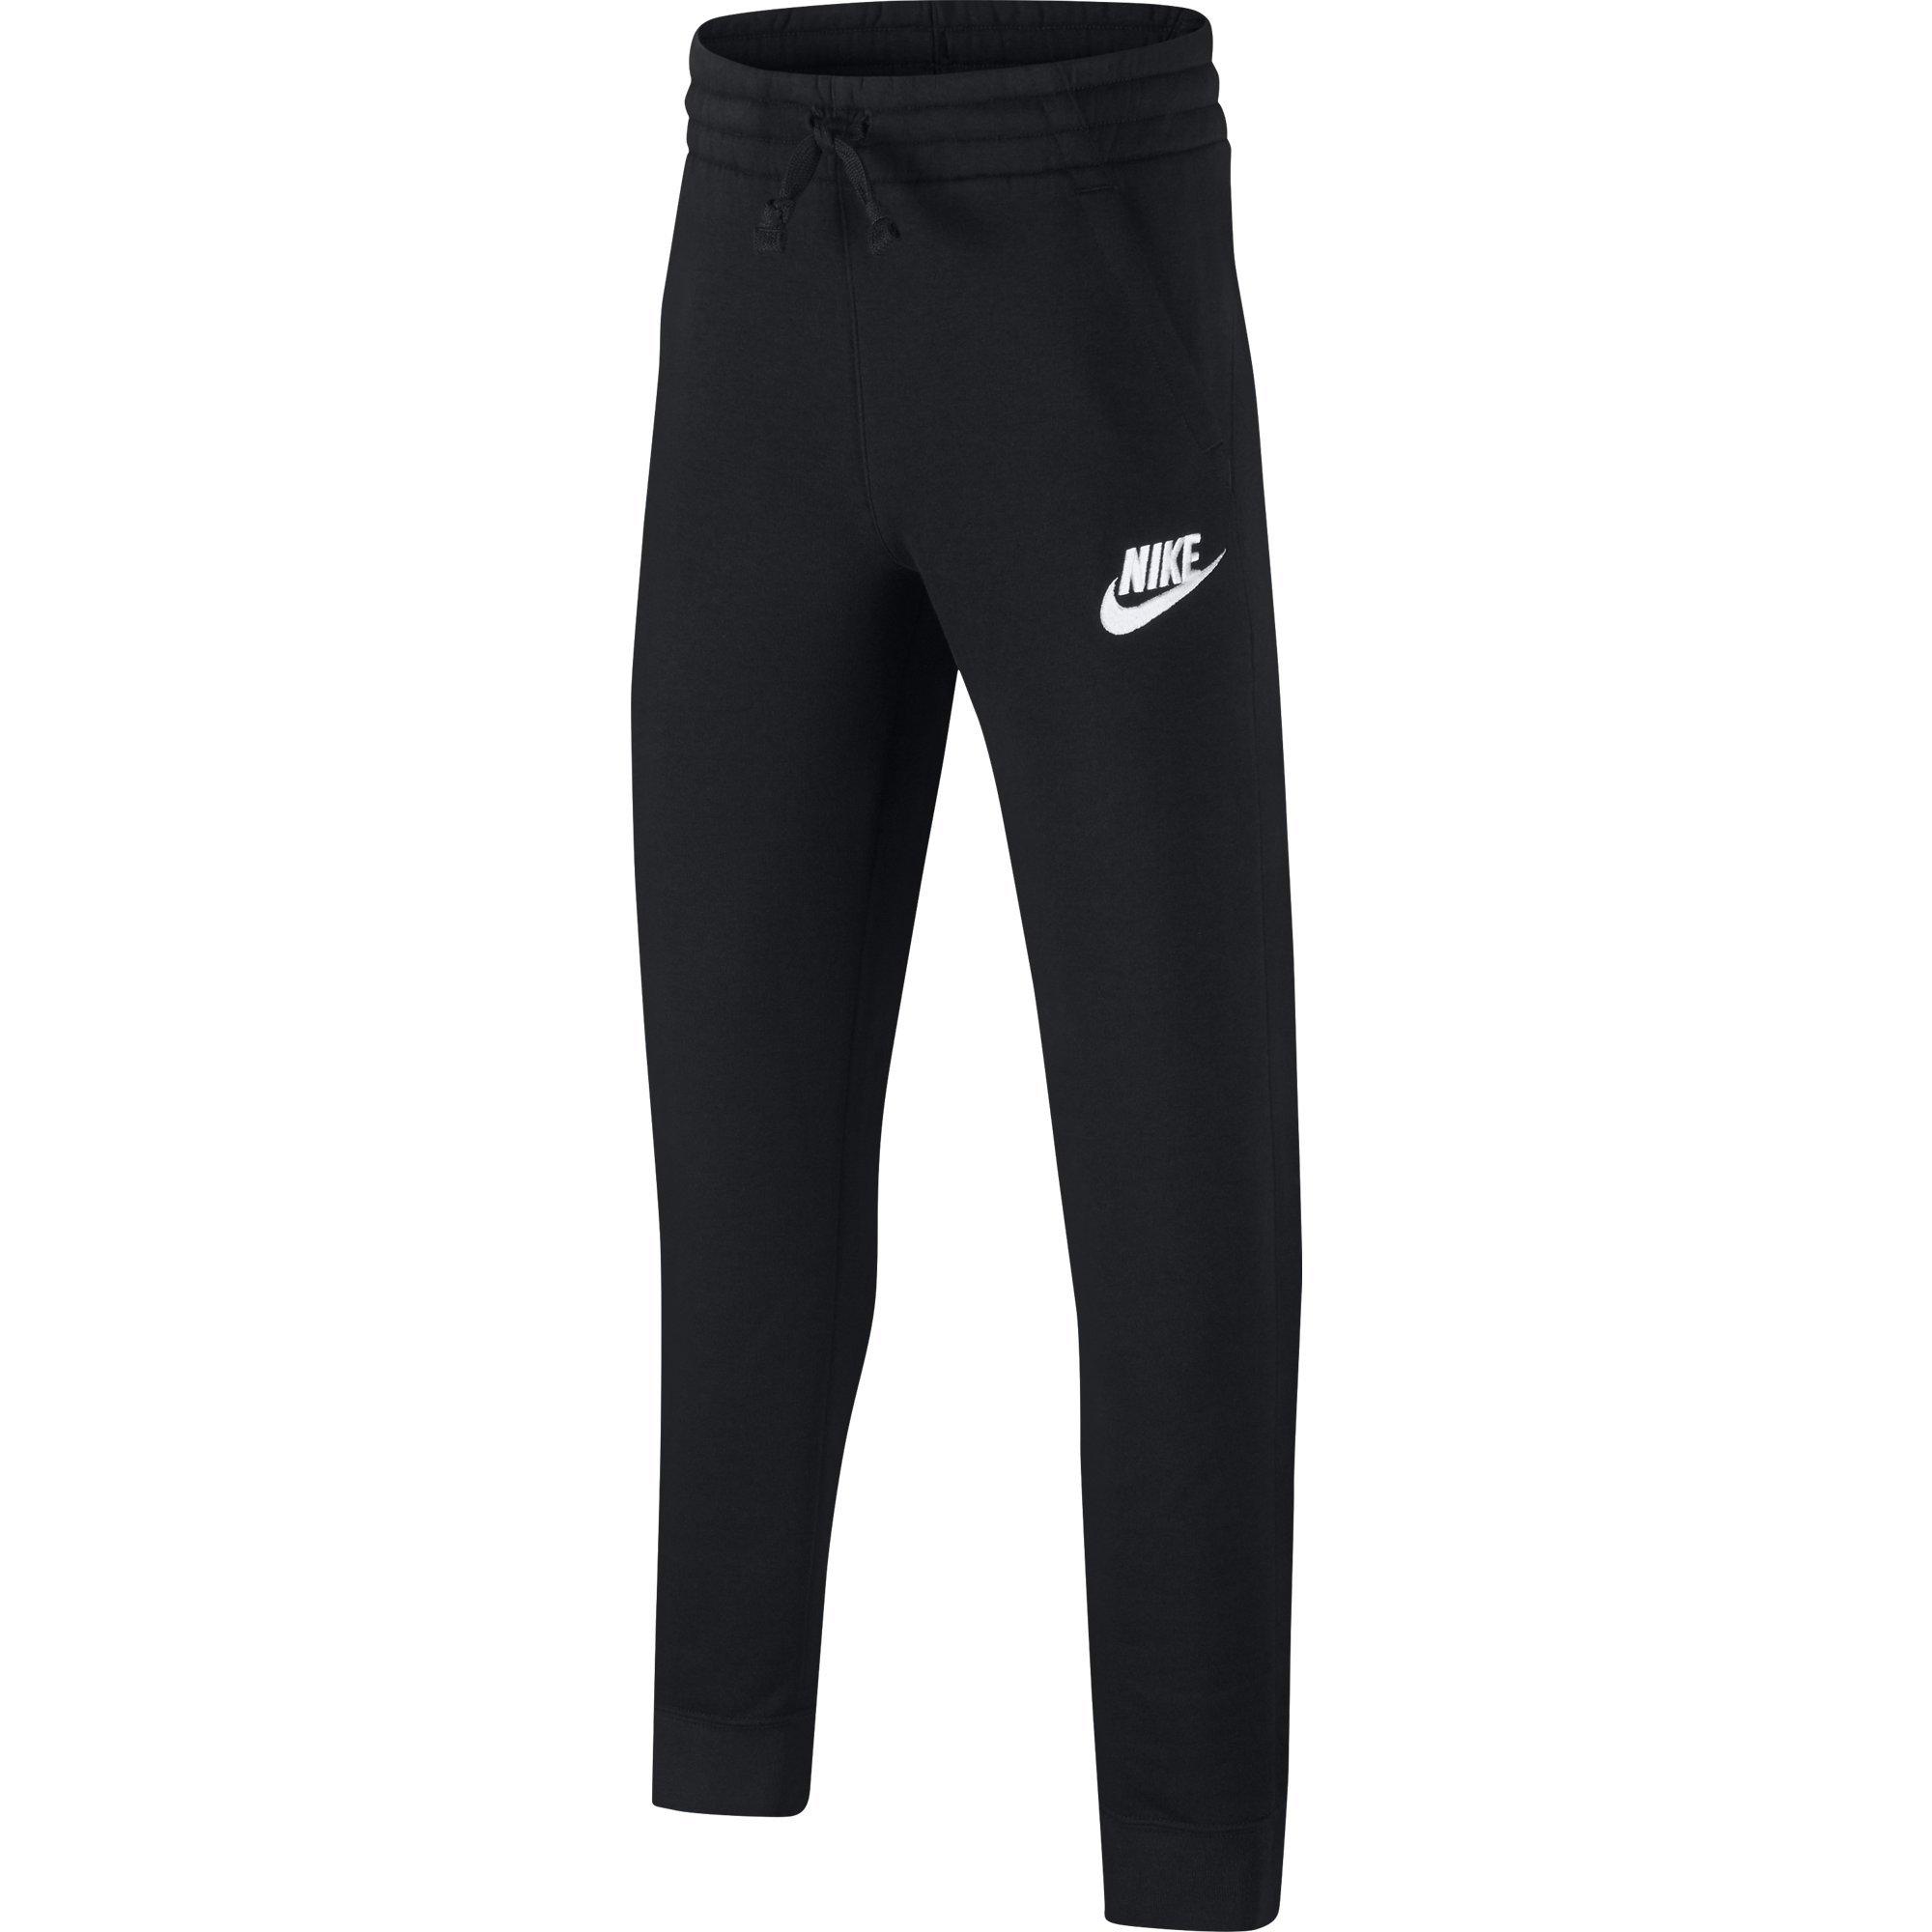 NIKE Sportswear Boys' Club Fleece Joggers, Black/Black/White, X-Small